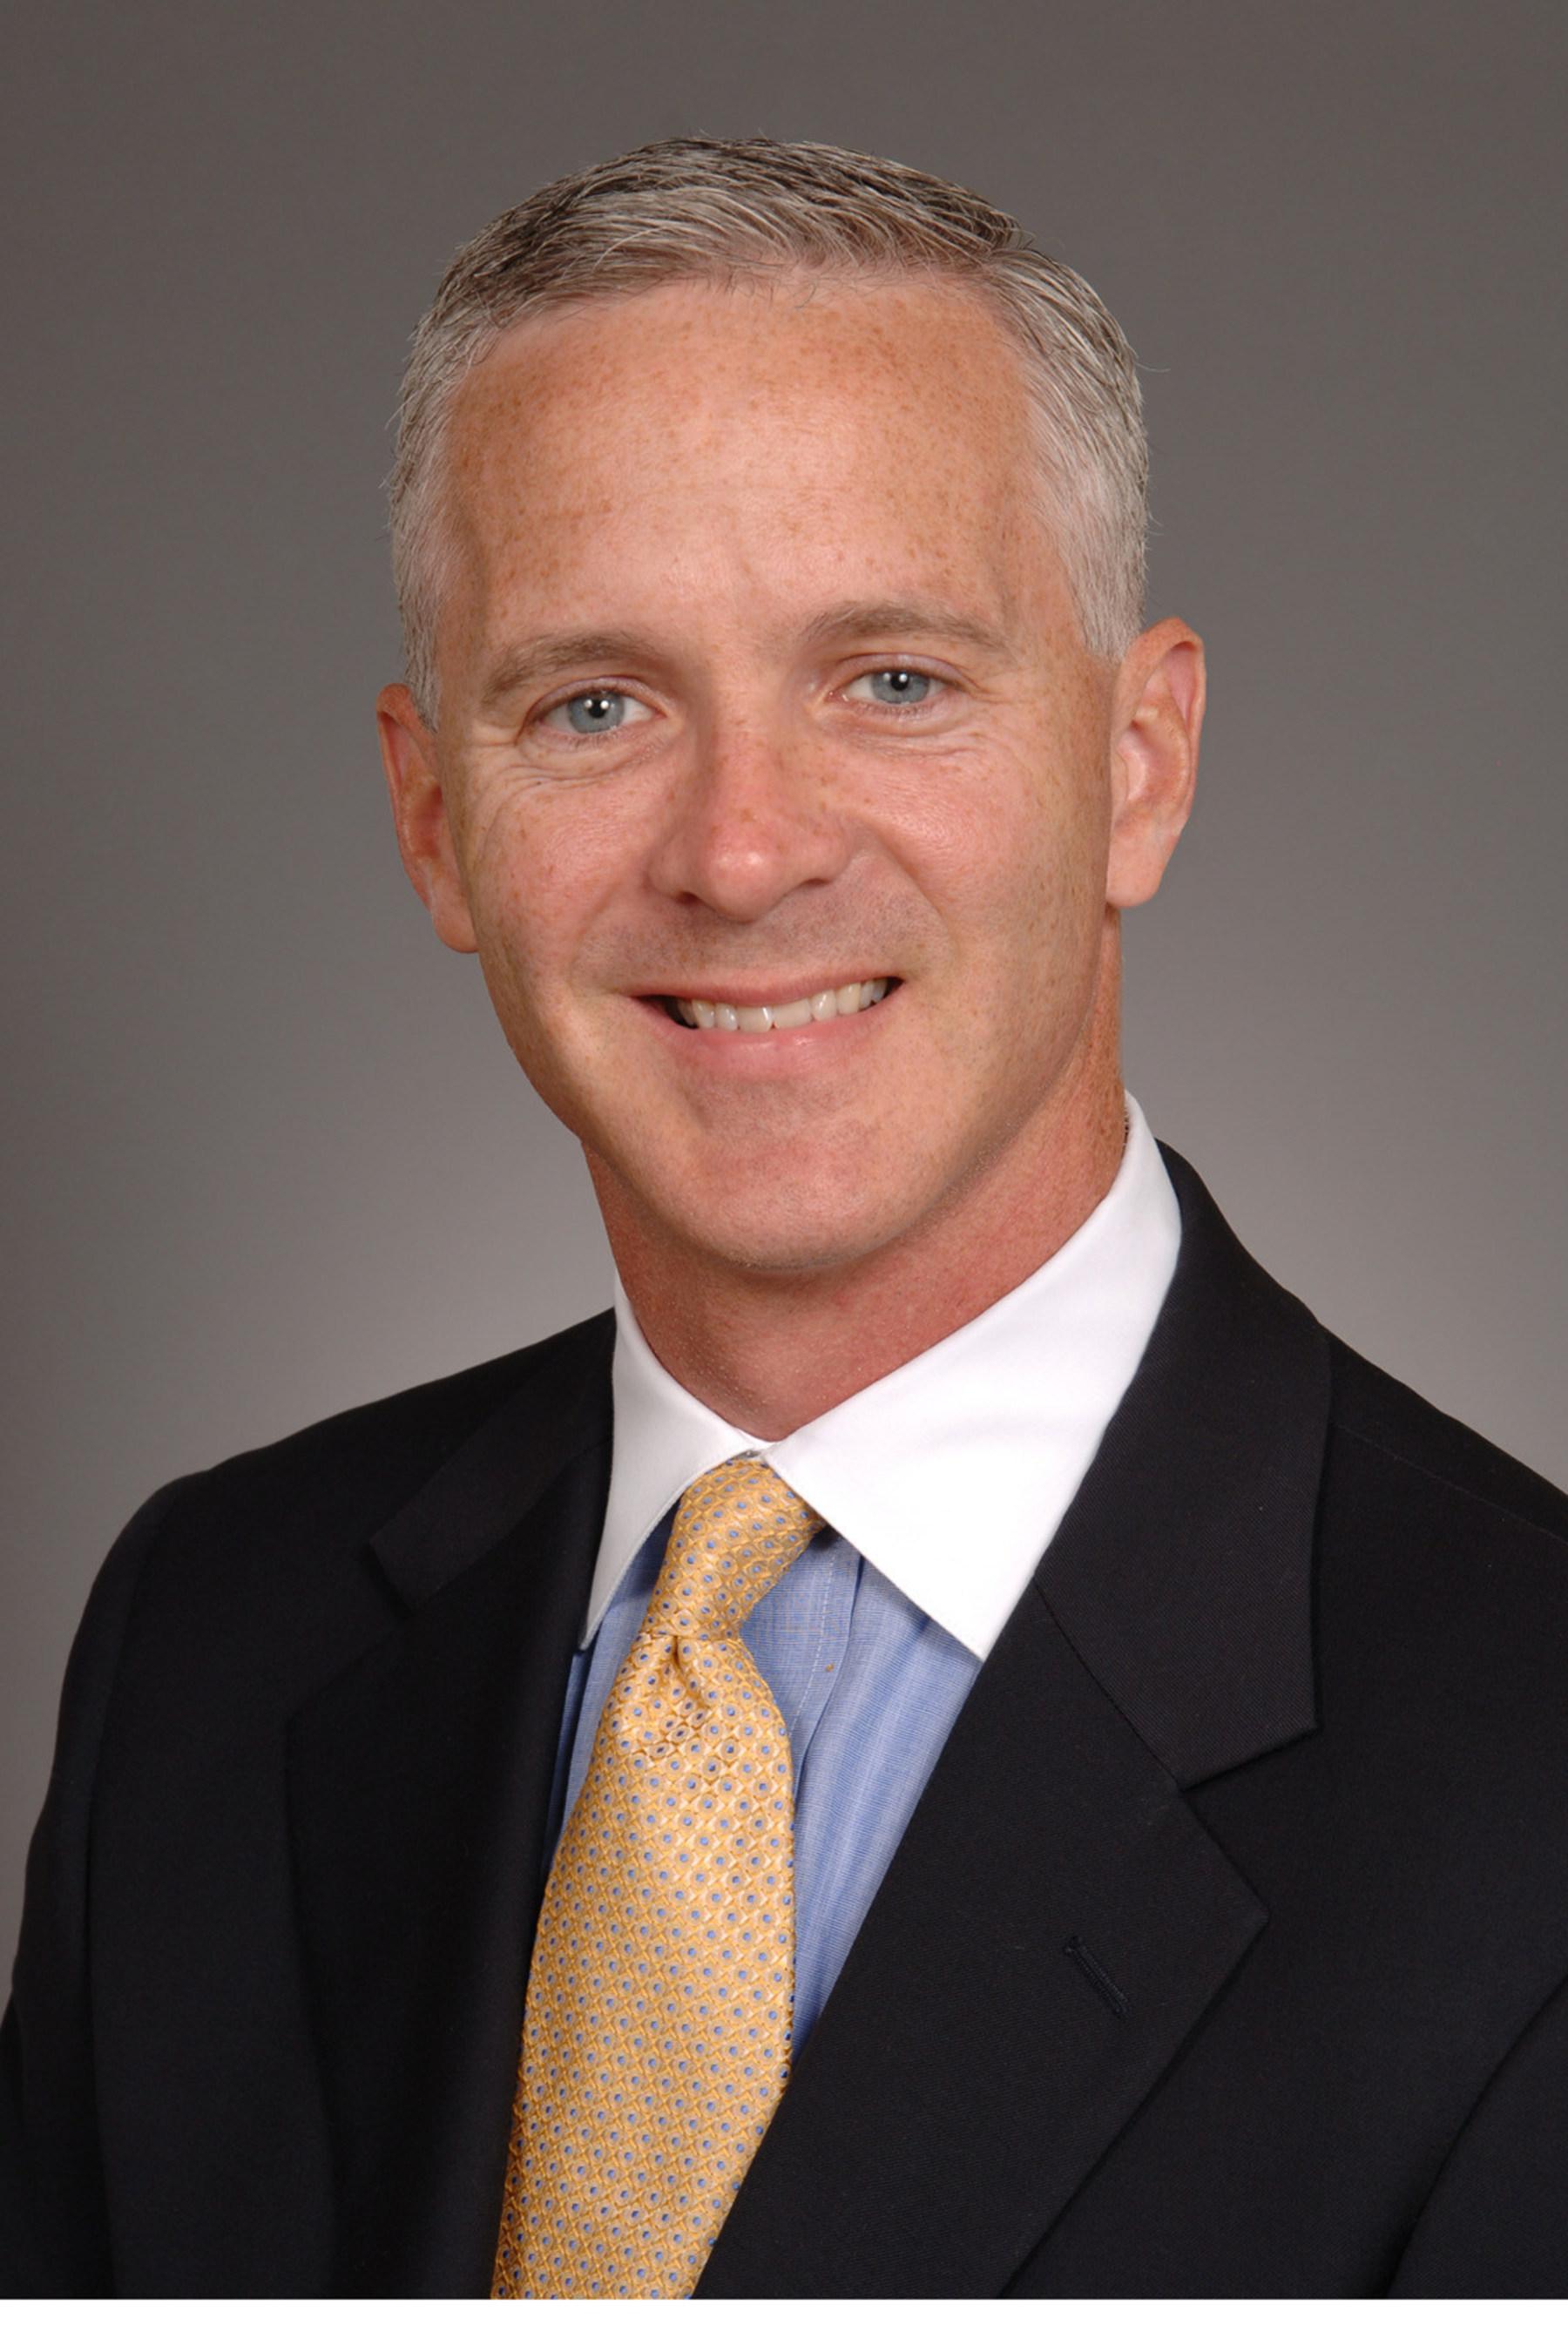 BNY Mellon Wealth Management Names Donald J. Heberle as CEO